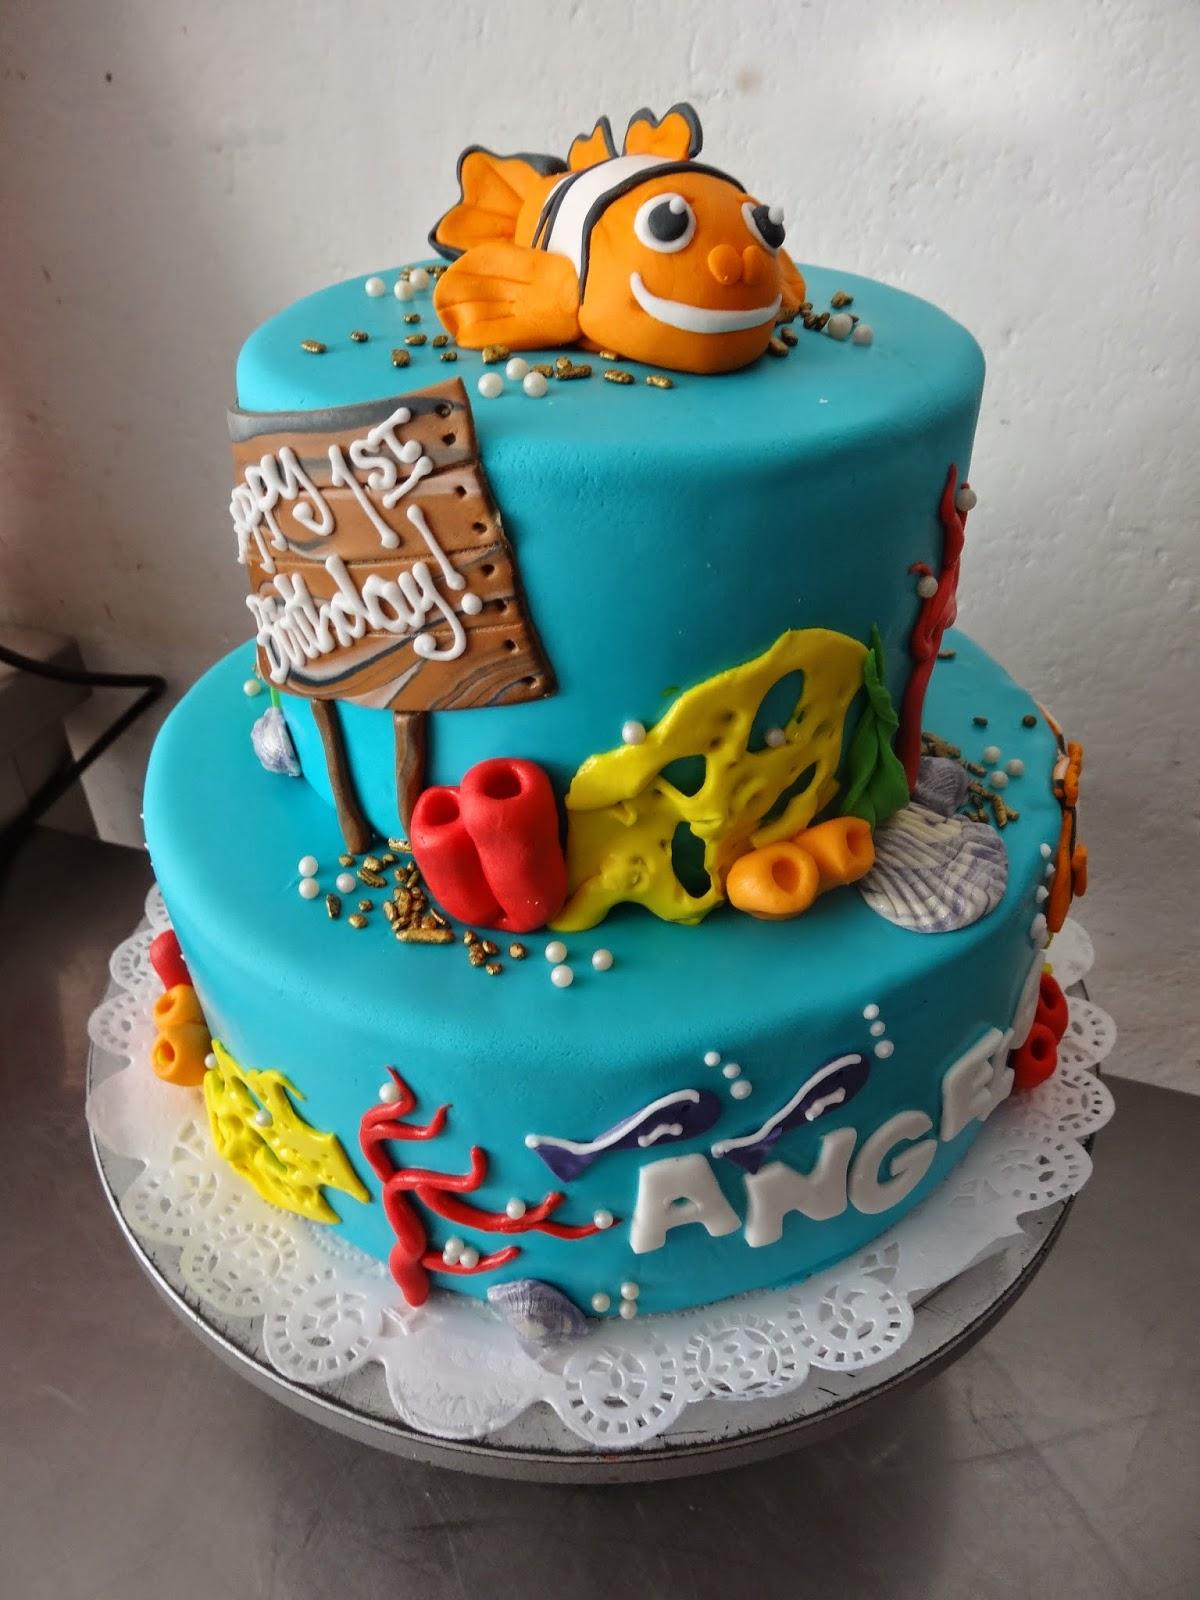 Cake Amsterdam 10 01 2014 11 01 2014